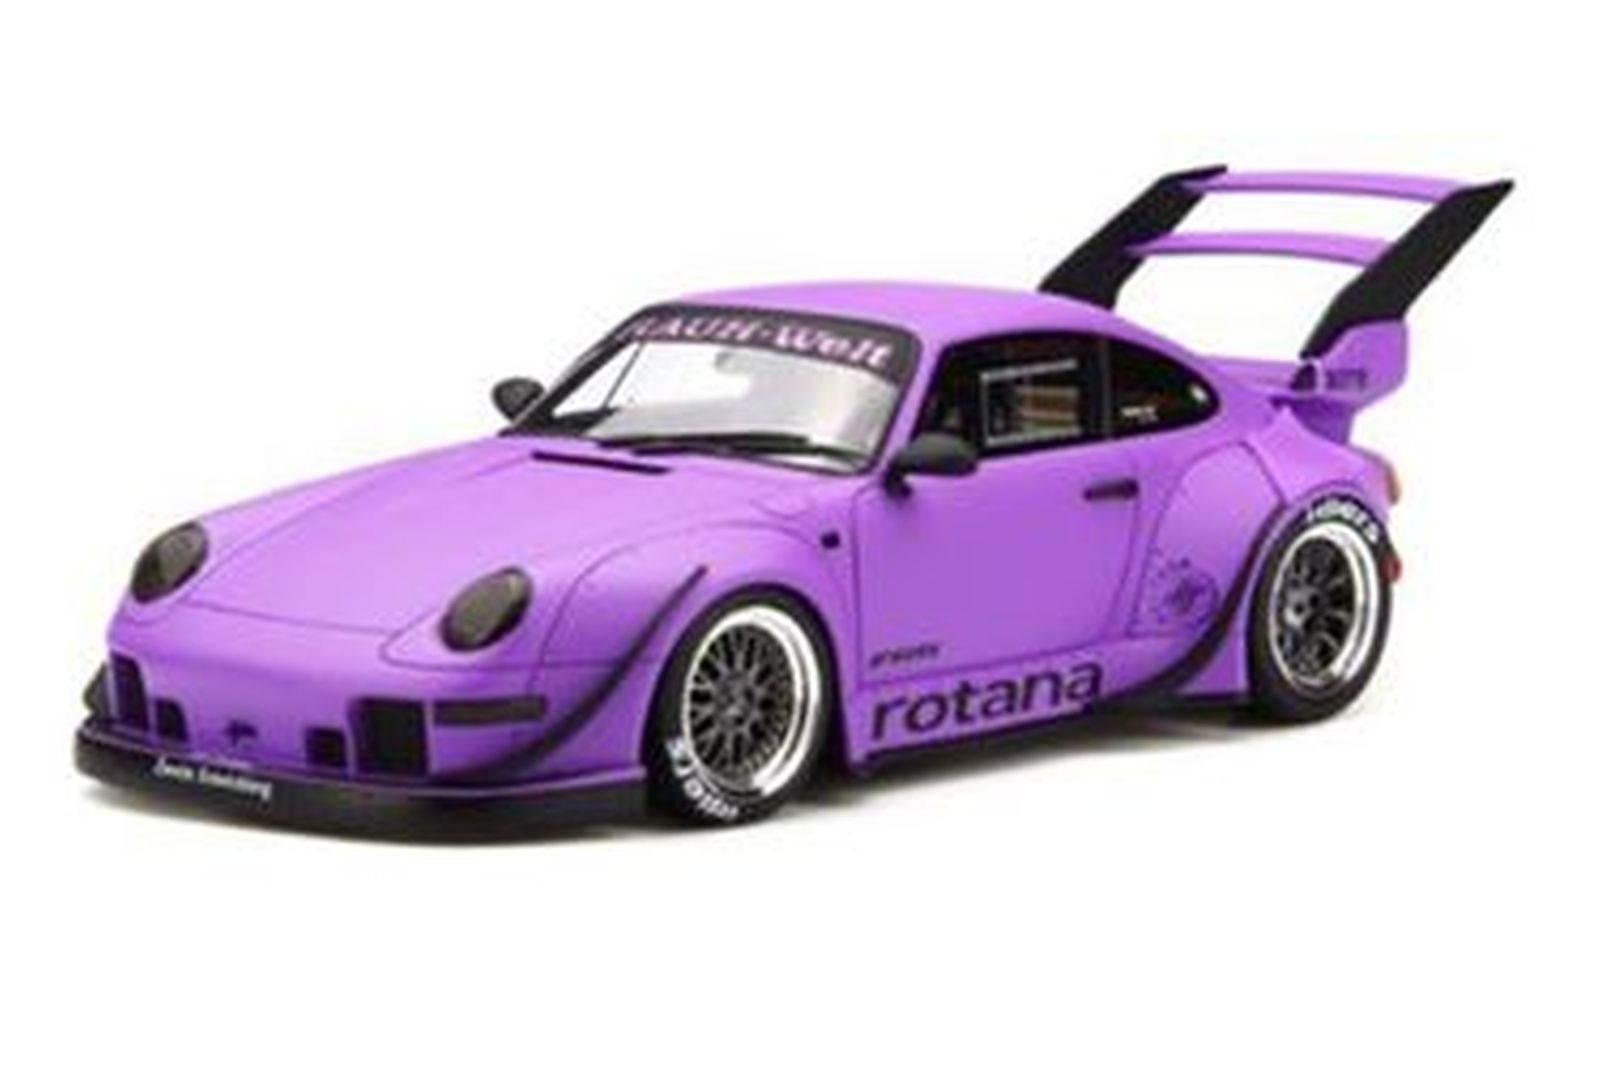 Model Car - Porsche GT737 RWB993 Rotana Purple  Brand - Gt Spirit (Scale - 1:18)